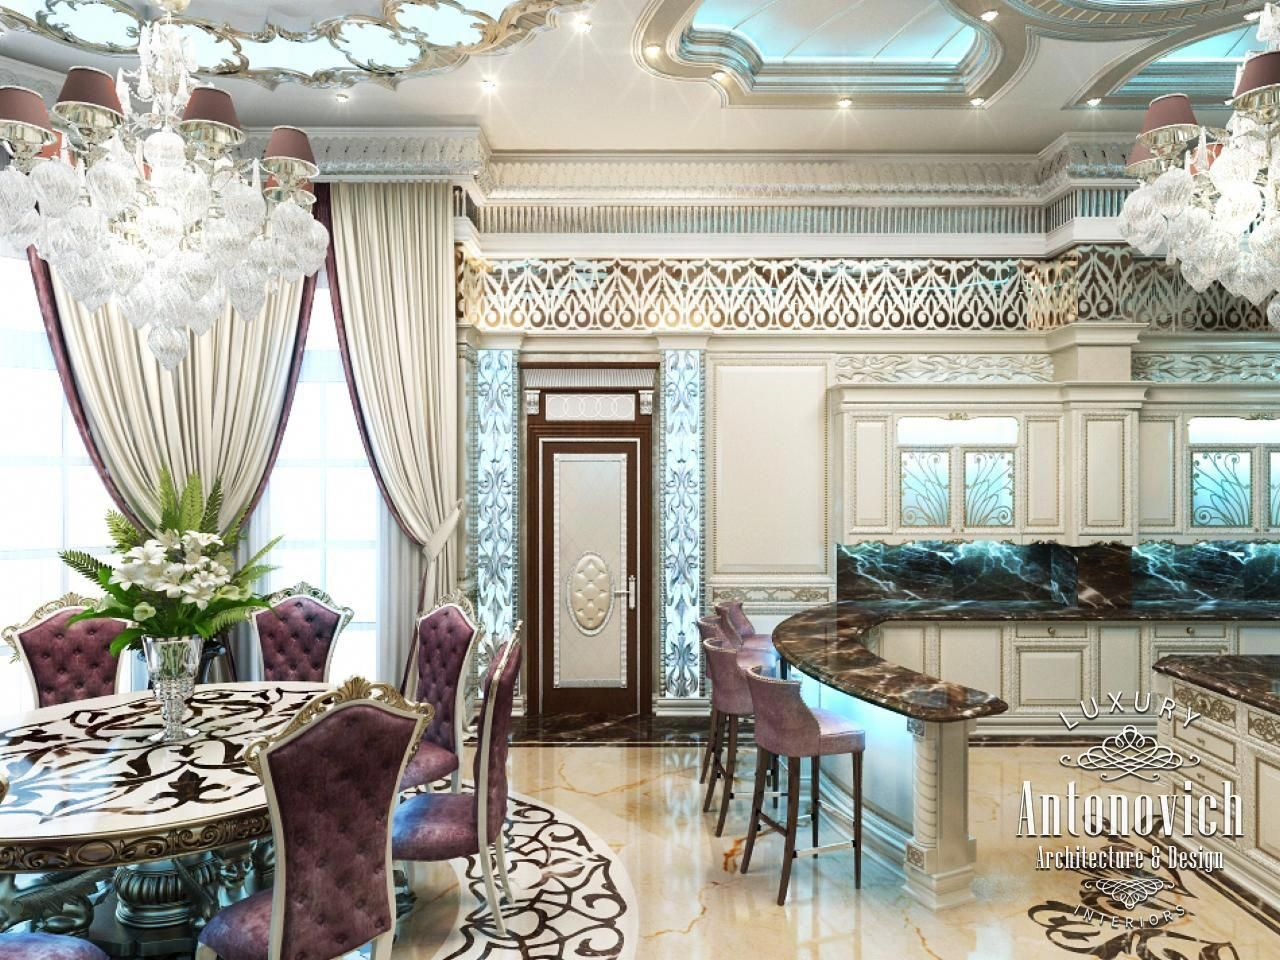 Kitchen design in dubai interior the uae photo interiordesigndubai also rh pinterest